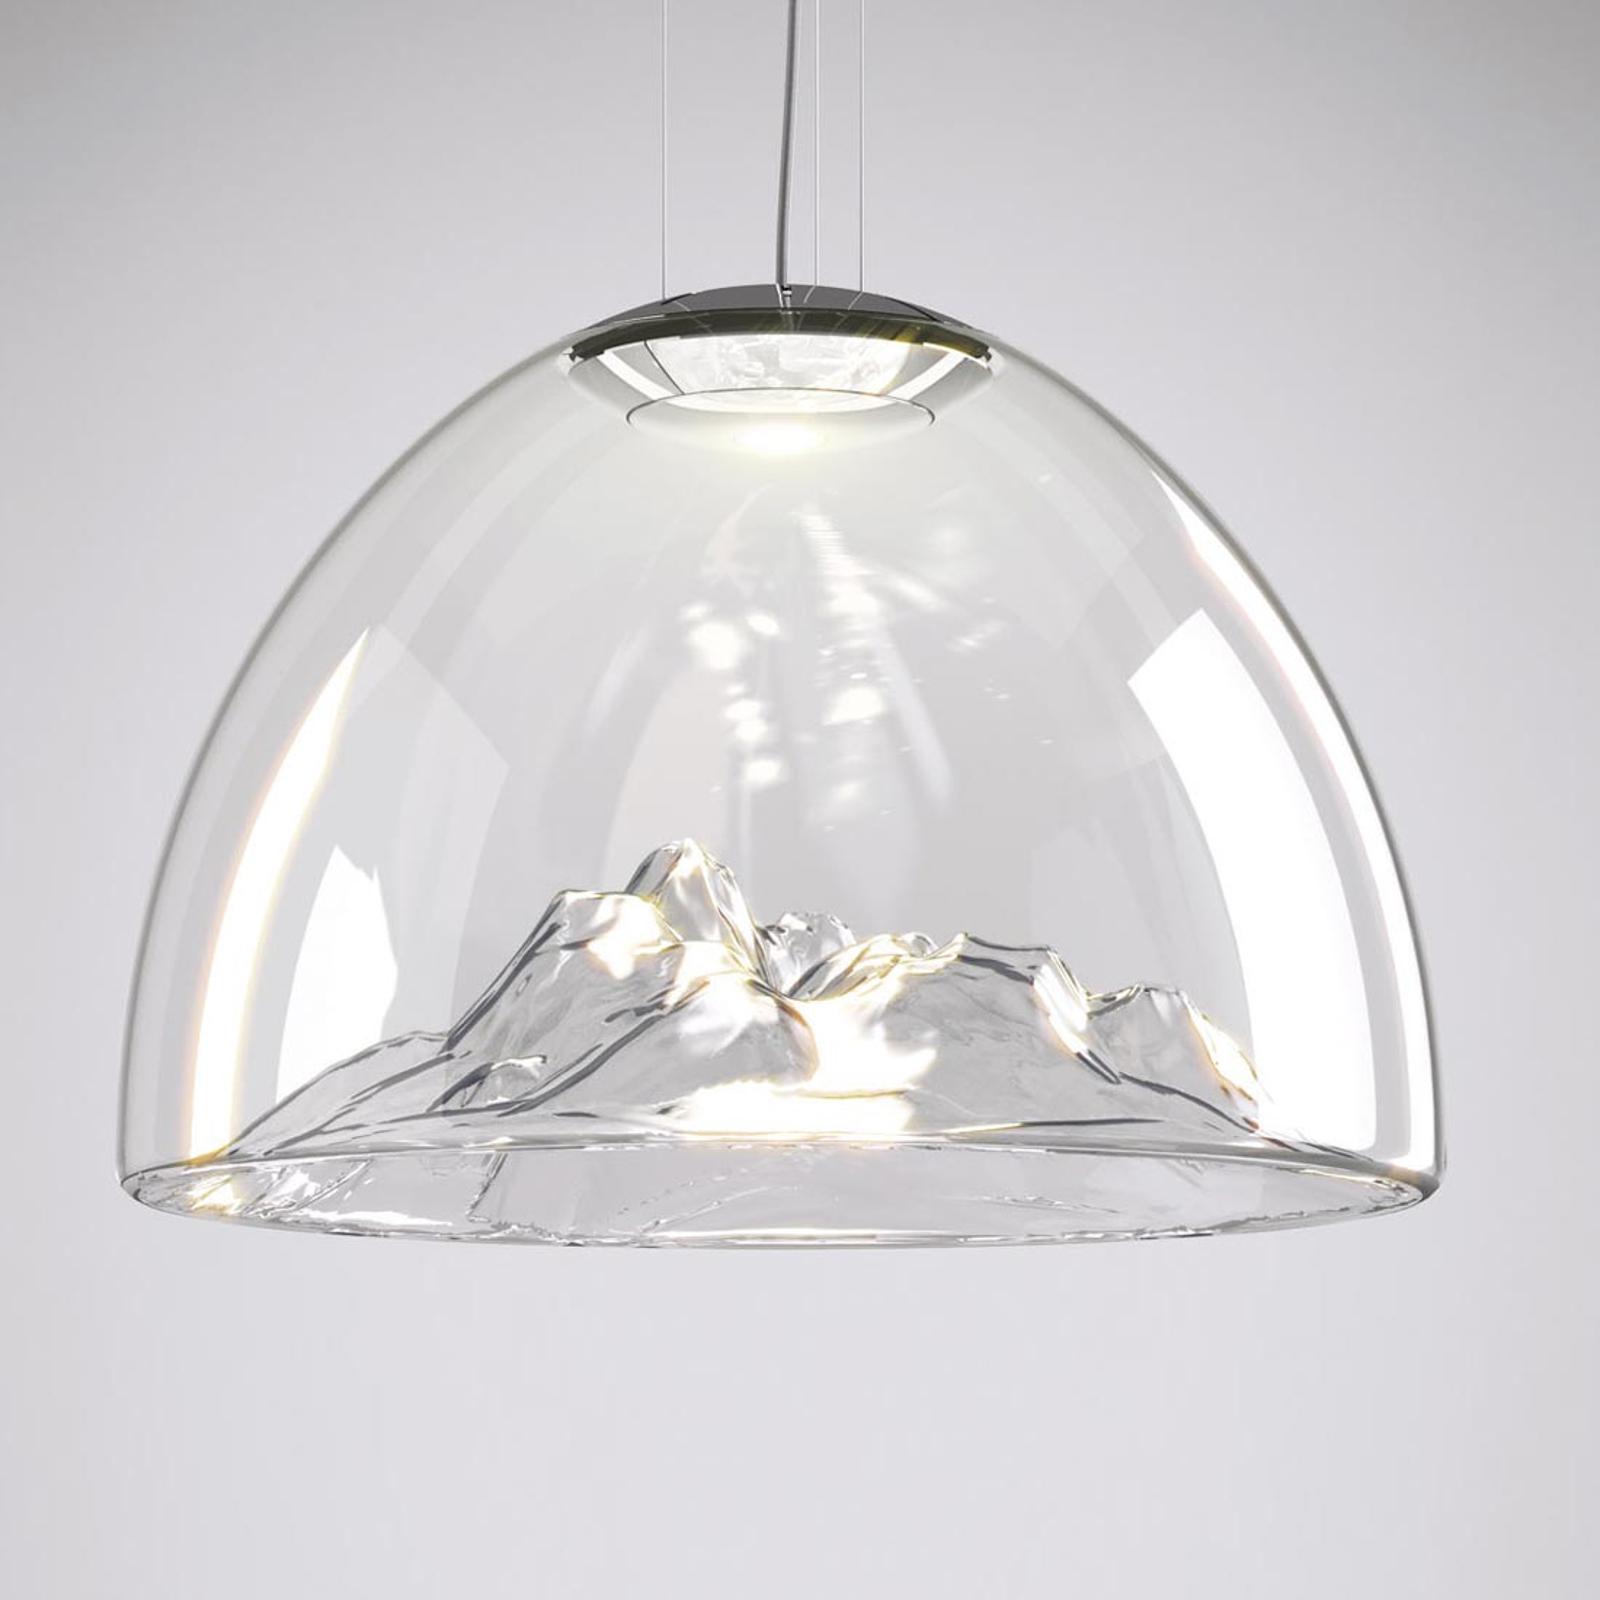 Axolight Mountain View LED-pendellampe klar-krom